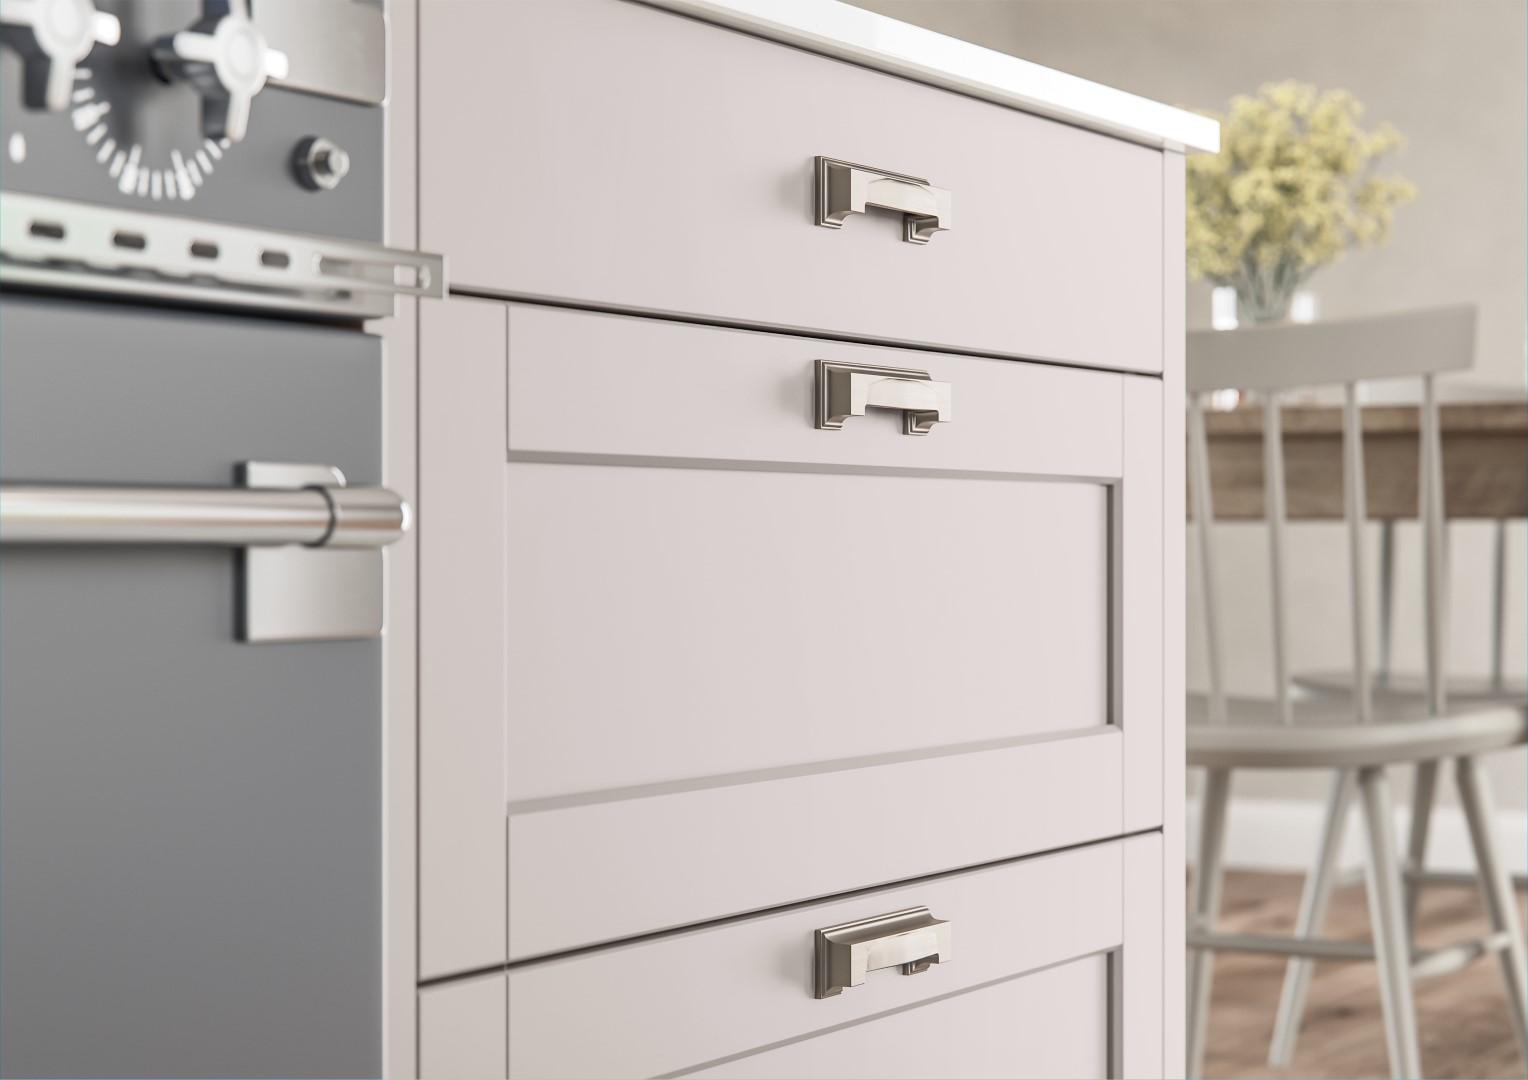 Dawson Porcelain and Cashmere - Kitchen Design - Alan Kelly Kitchens - Waterford - 4